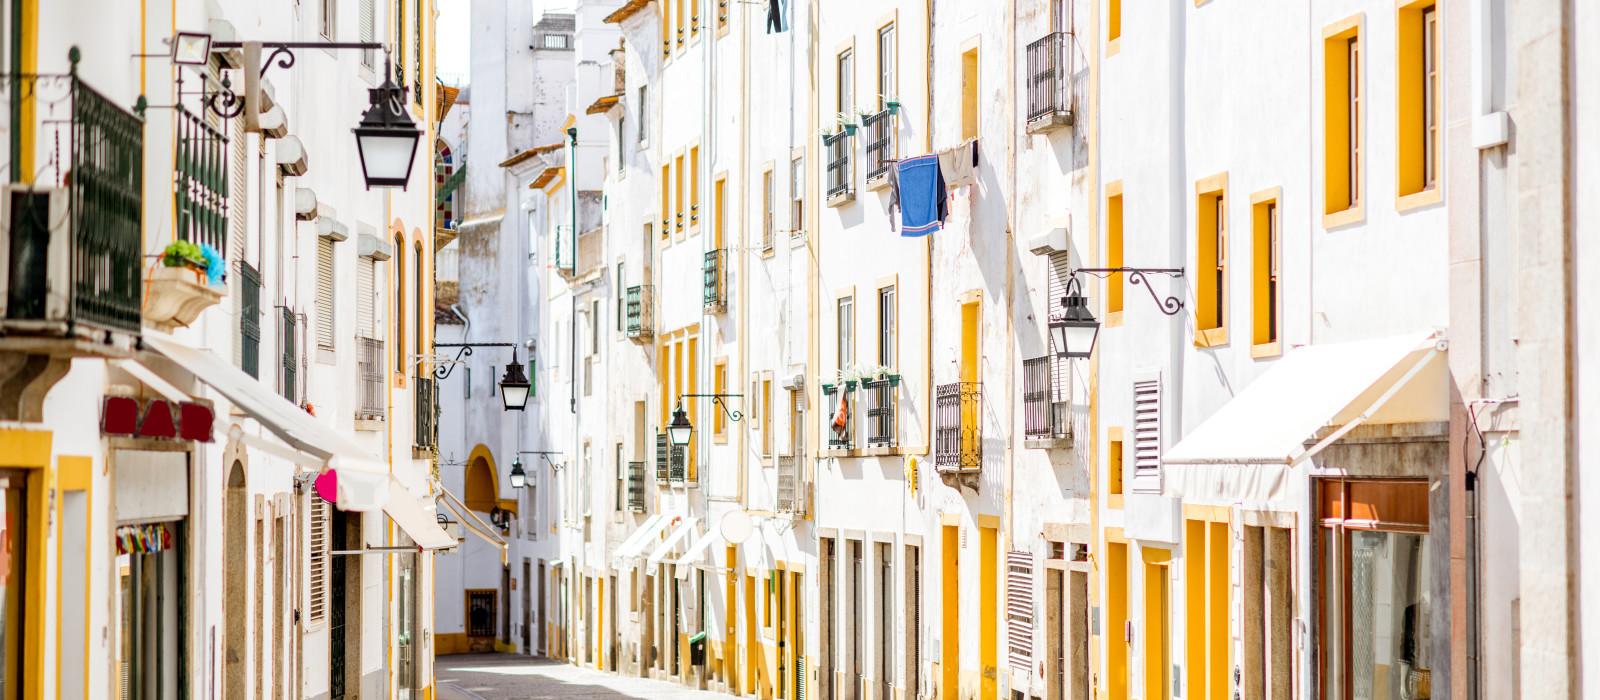 Reiseziel Alentejo Portugal